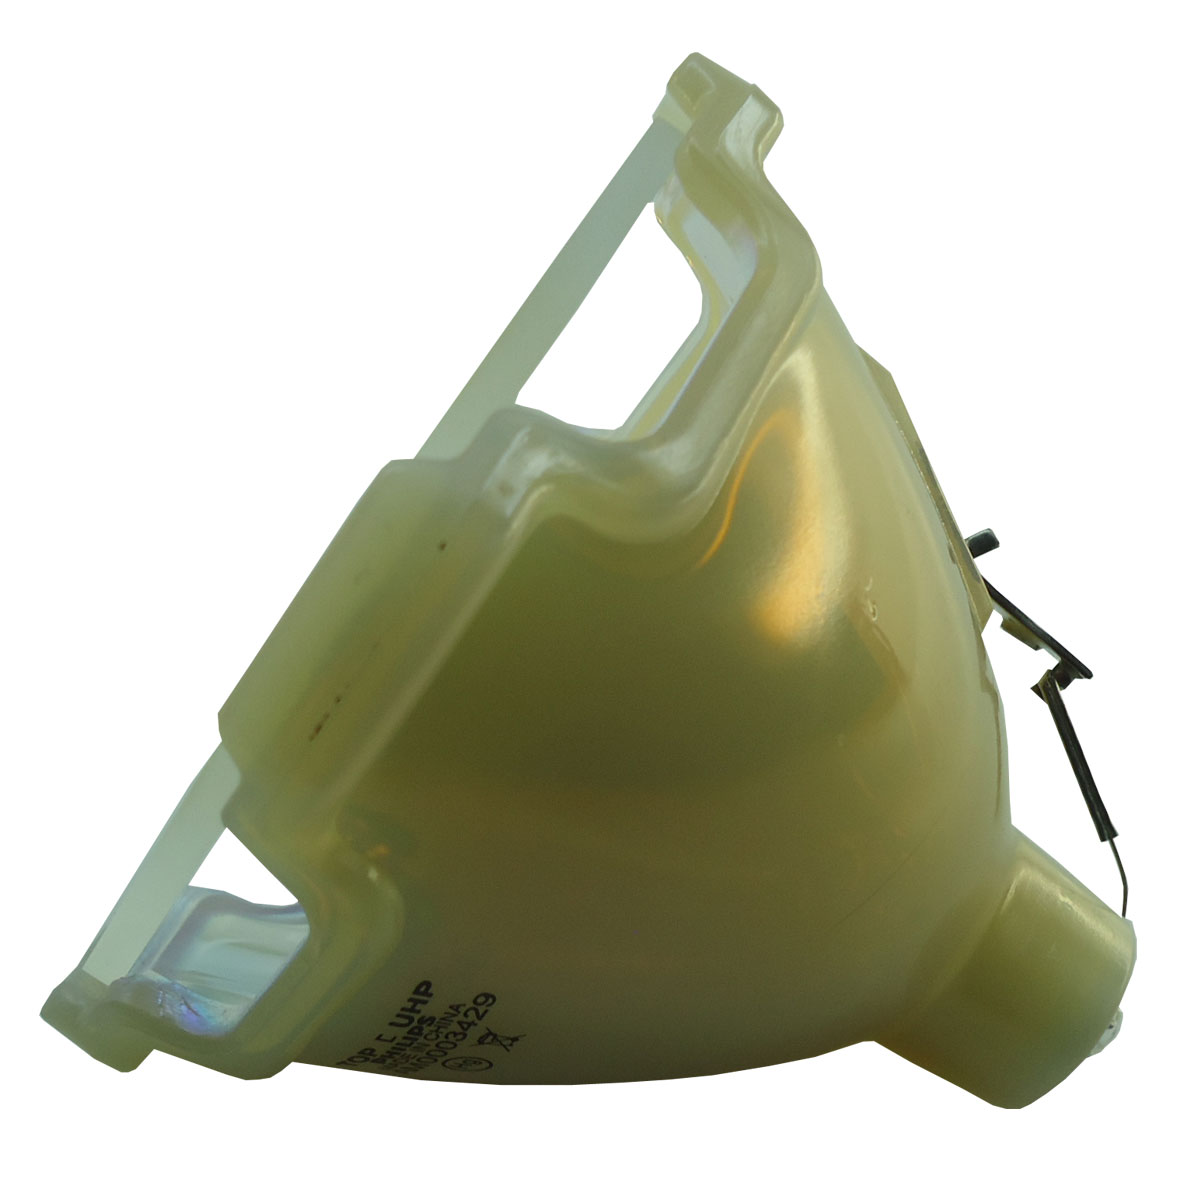 Lutema Platinum Bulb for Christie LS+58 Projector Lamp (Original Philips Inside) - image 2 de 5